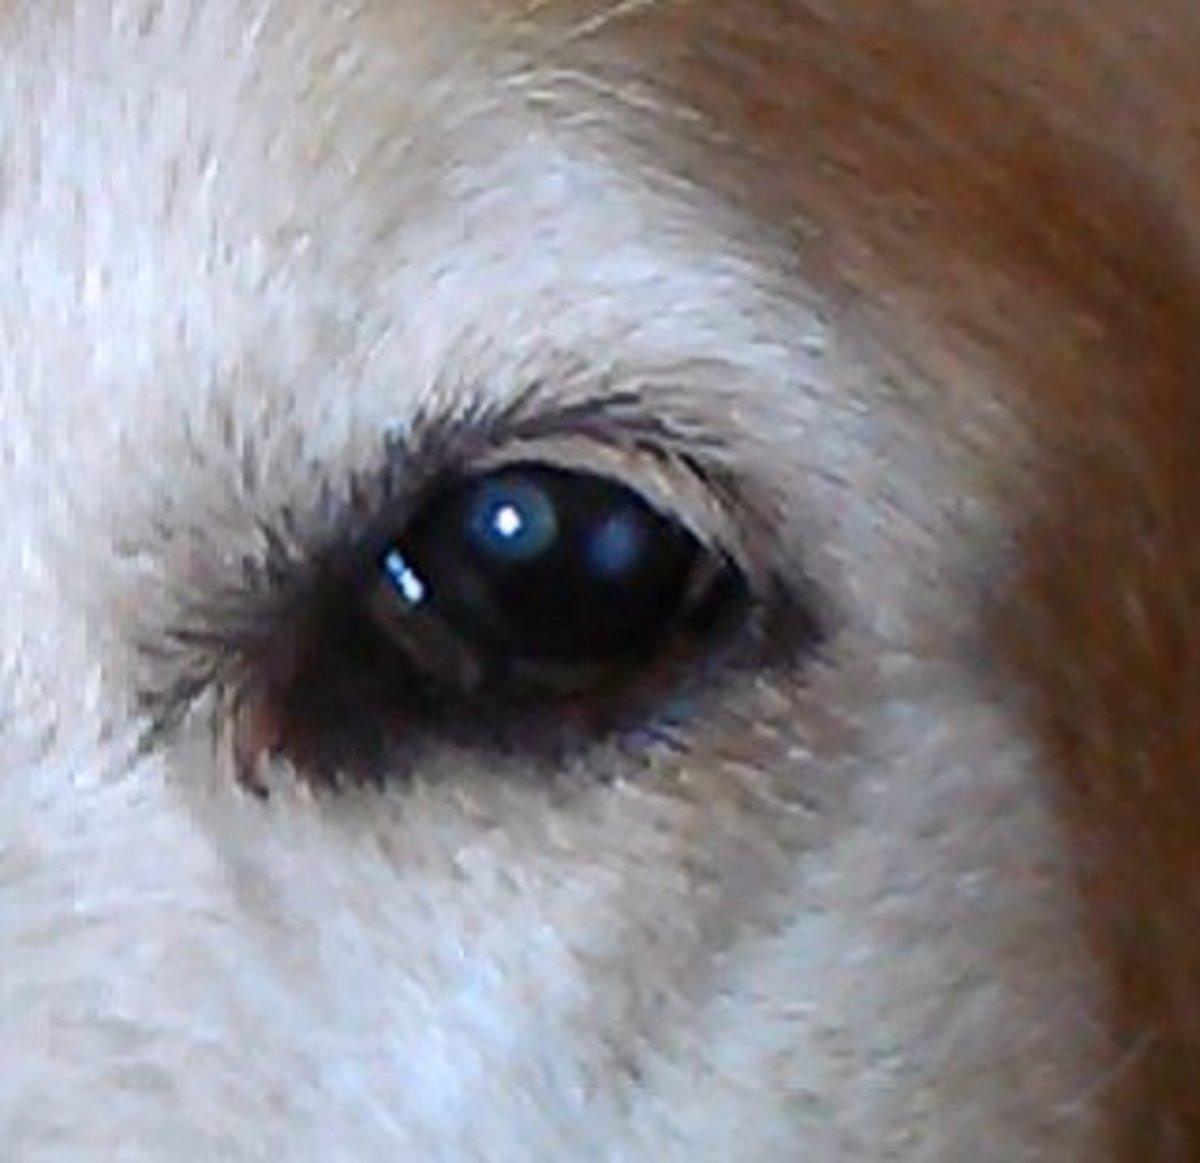 Dog eye with cholesterol deposit